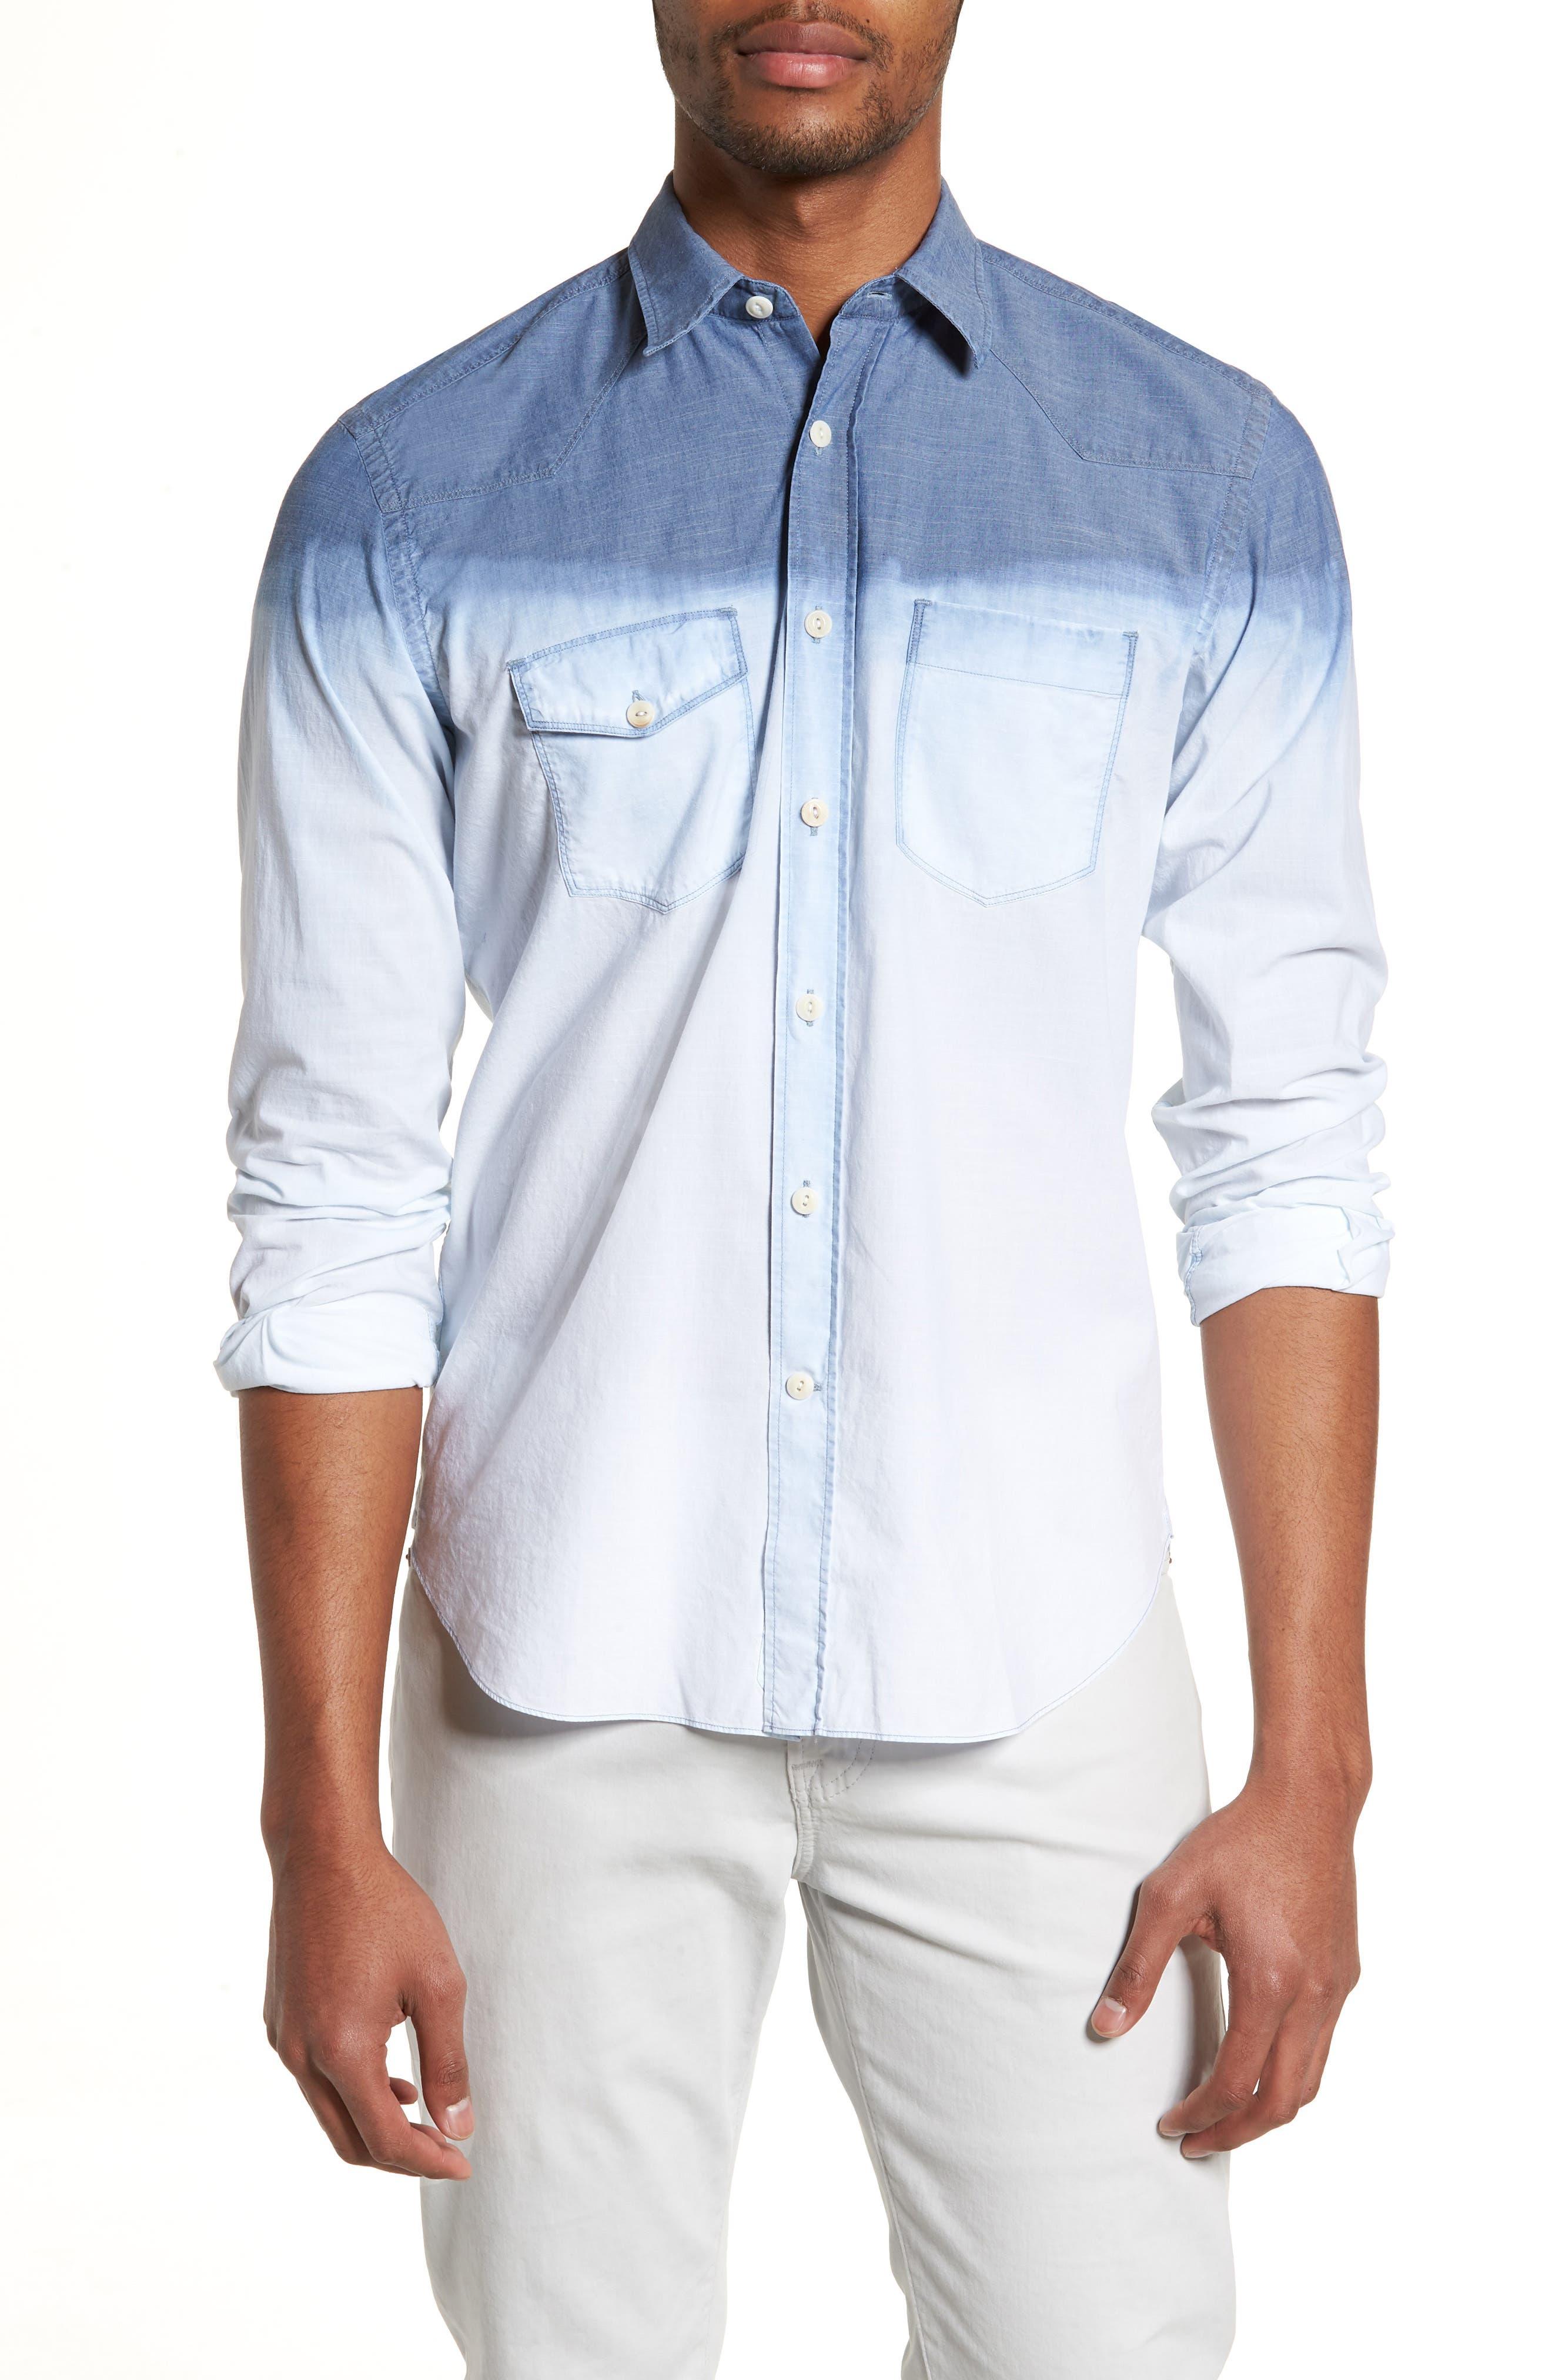 Alternate Image 1 Selected - Culturata Tailored Fit Dégradé Sport Shirt